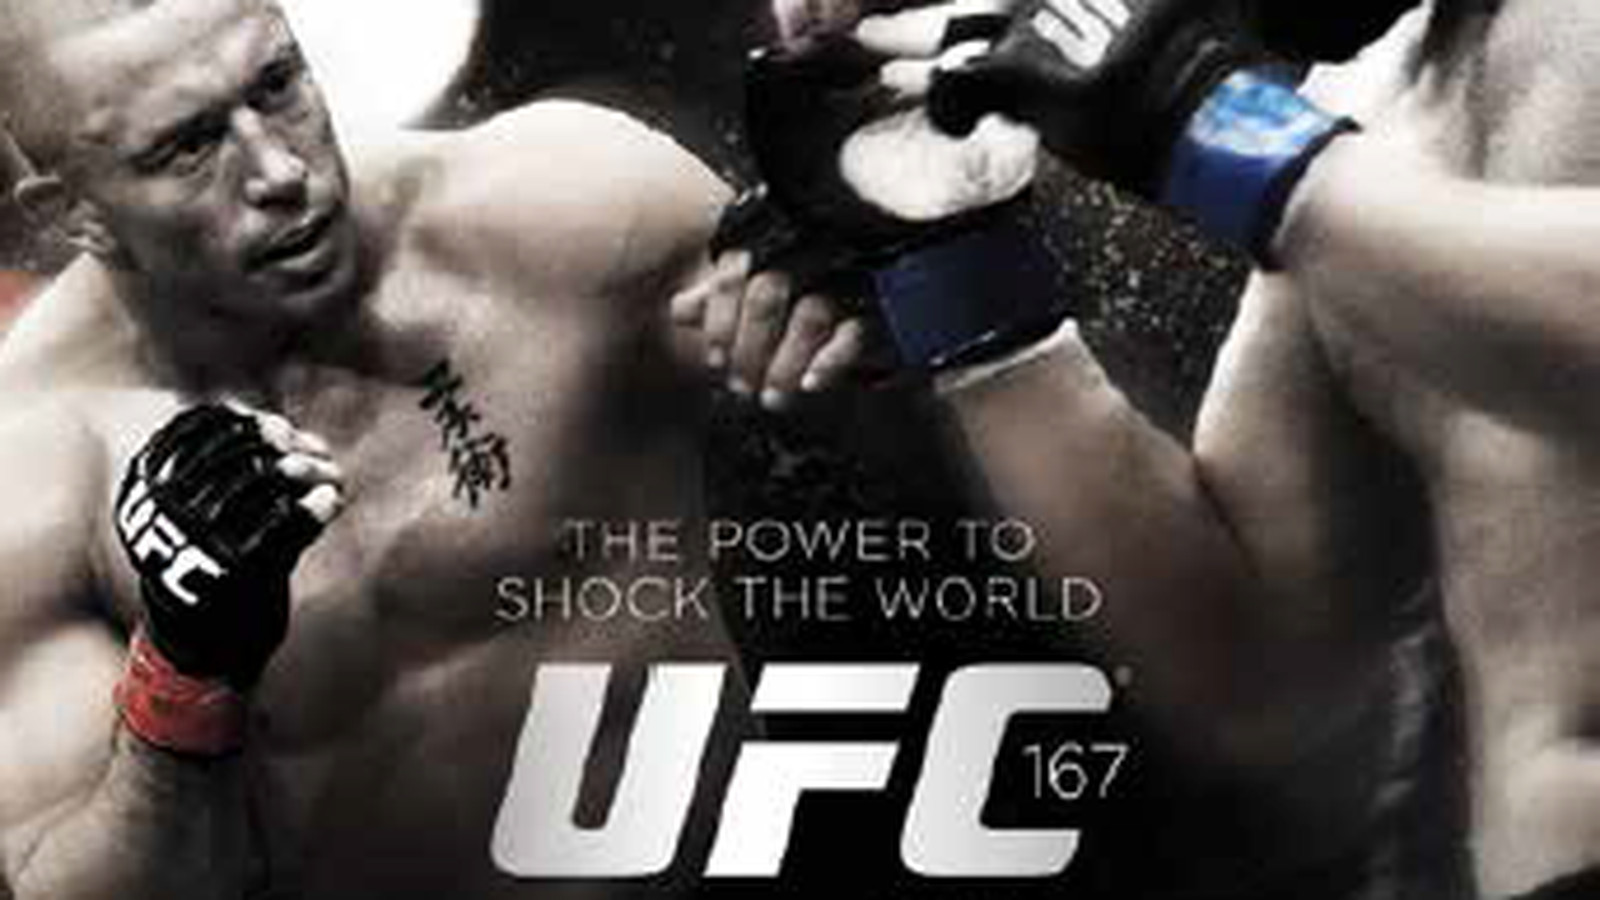 Ufc 168 Fight Poster UFC 167 full poster pi...